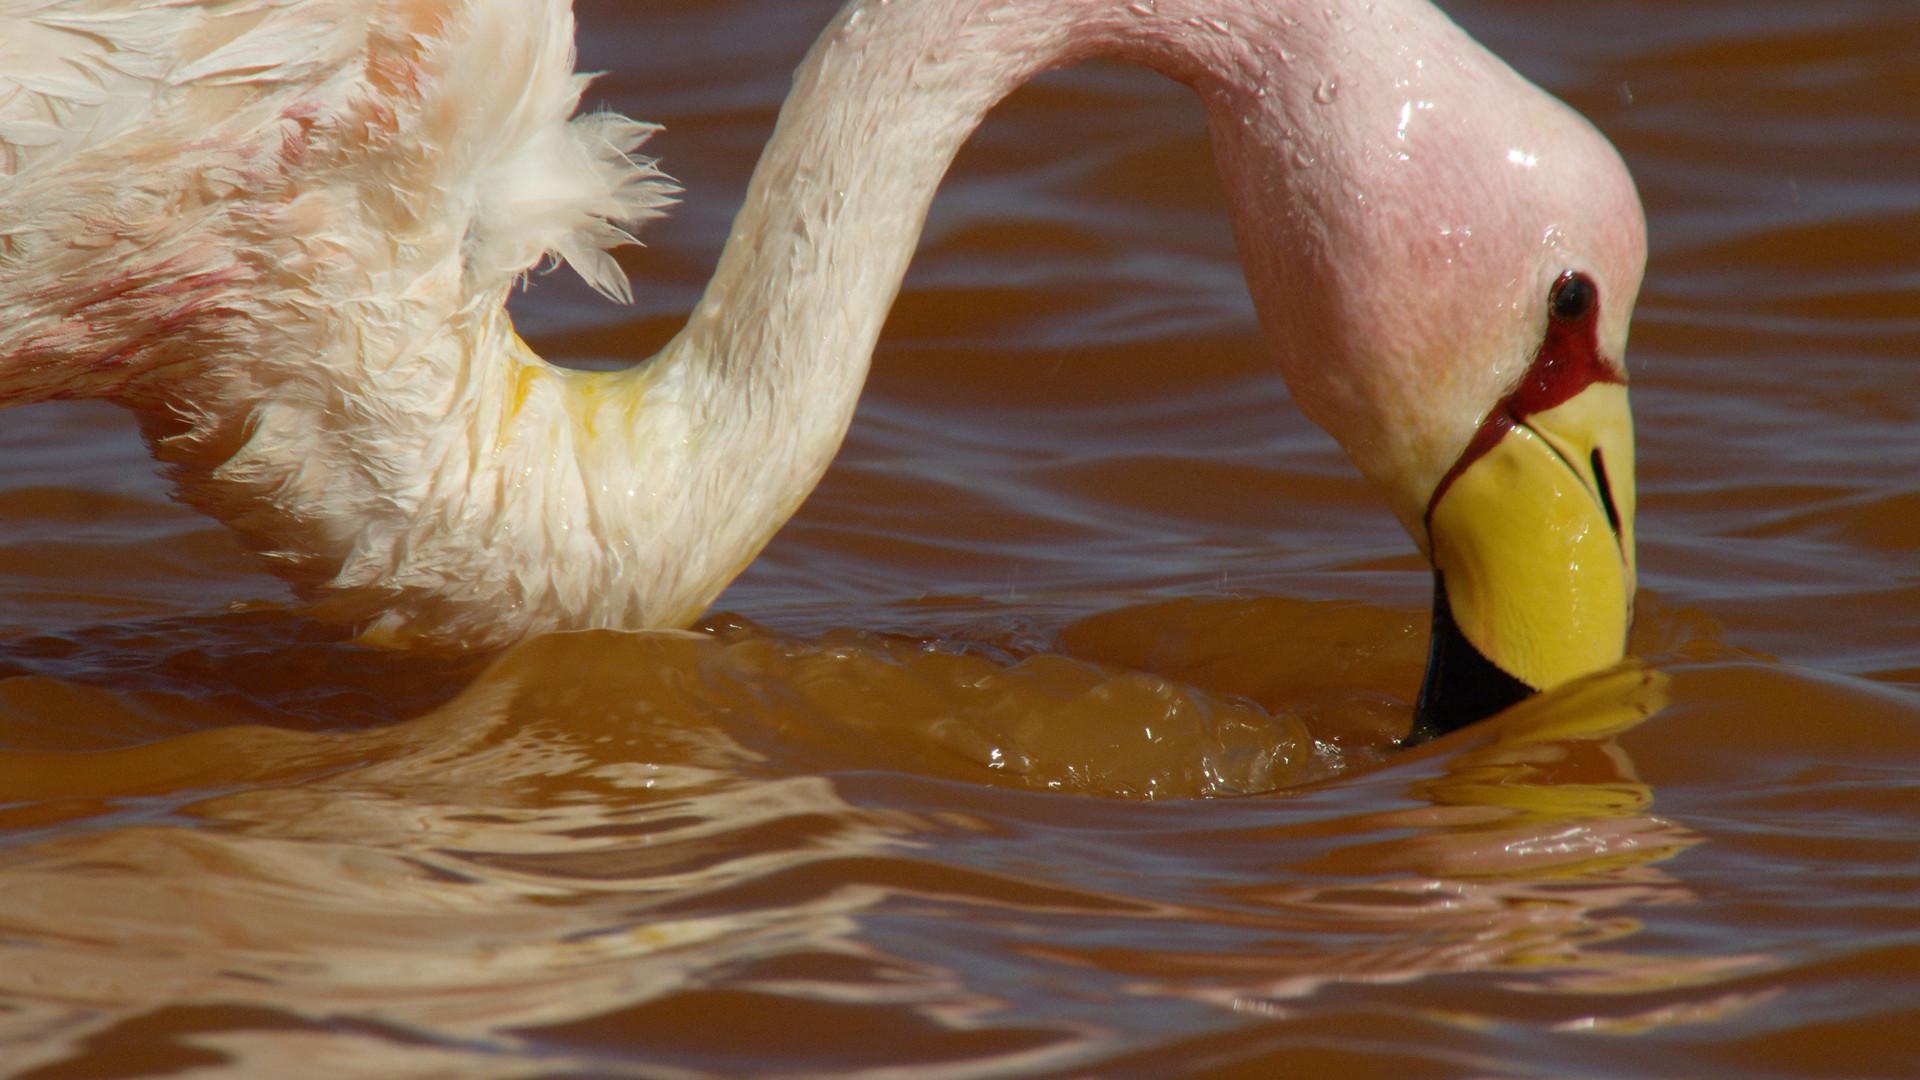 TWA_Ep2_05_flamingo.jpg